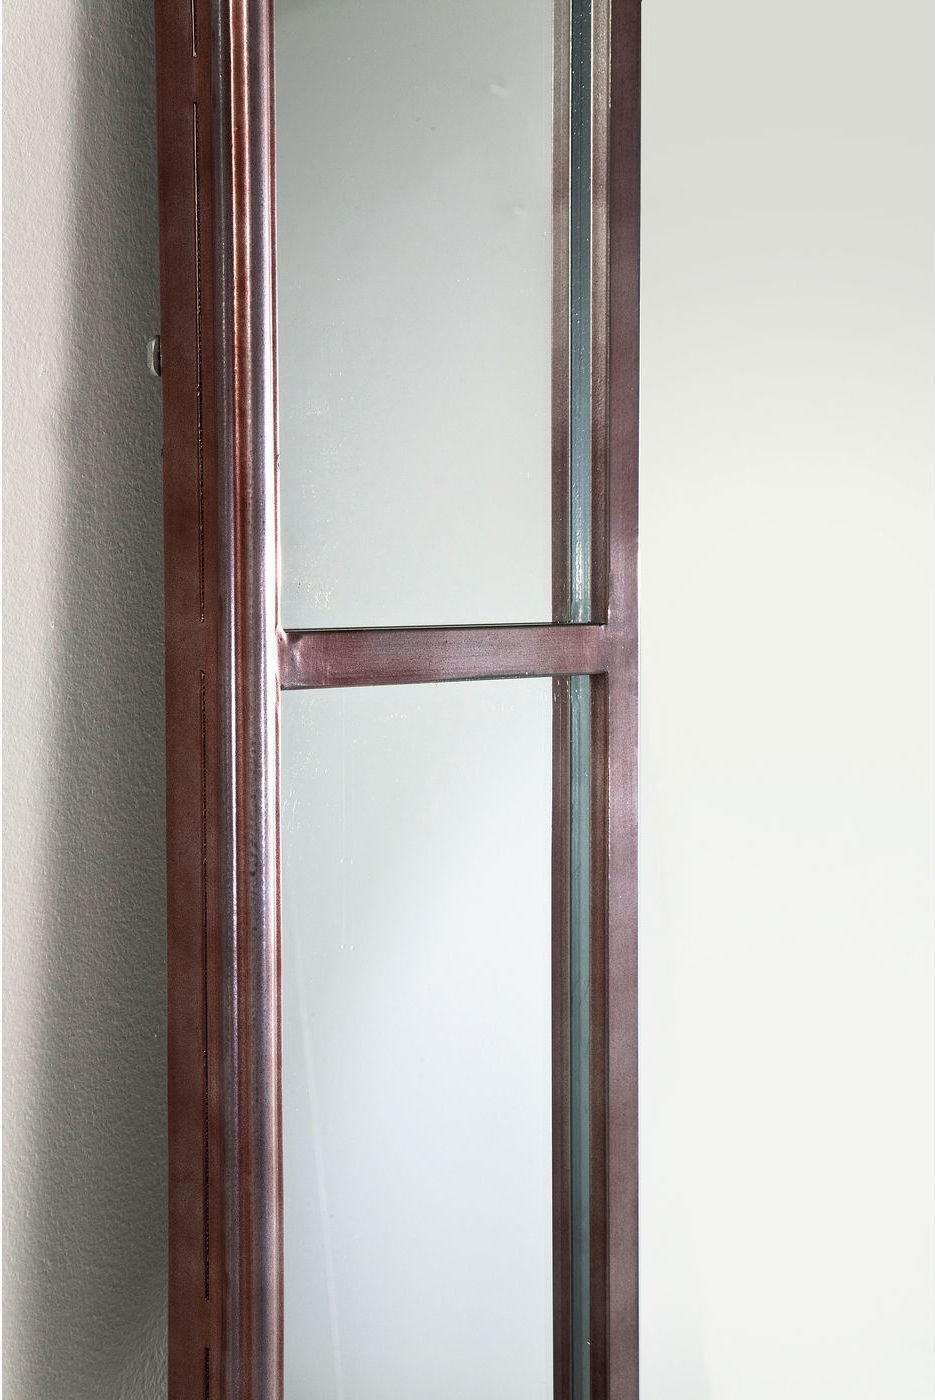 kare design spiegel window iron 200x90cm meubelen verlichting. Black Bedroom Furniture Sets. Home Design Ideas